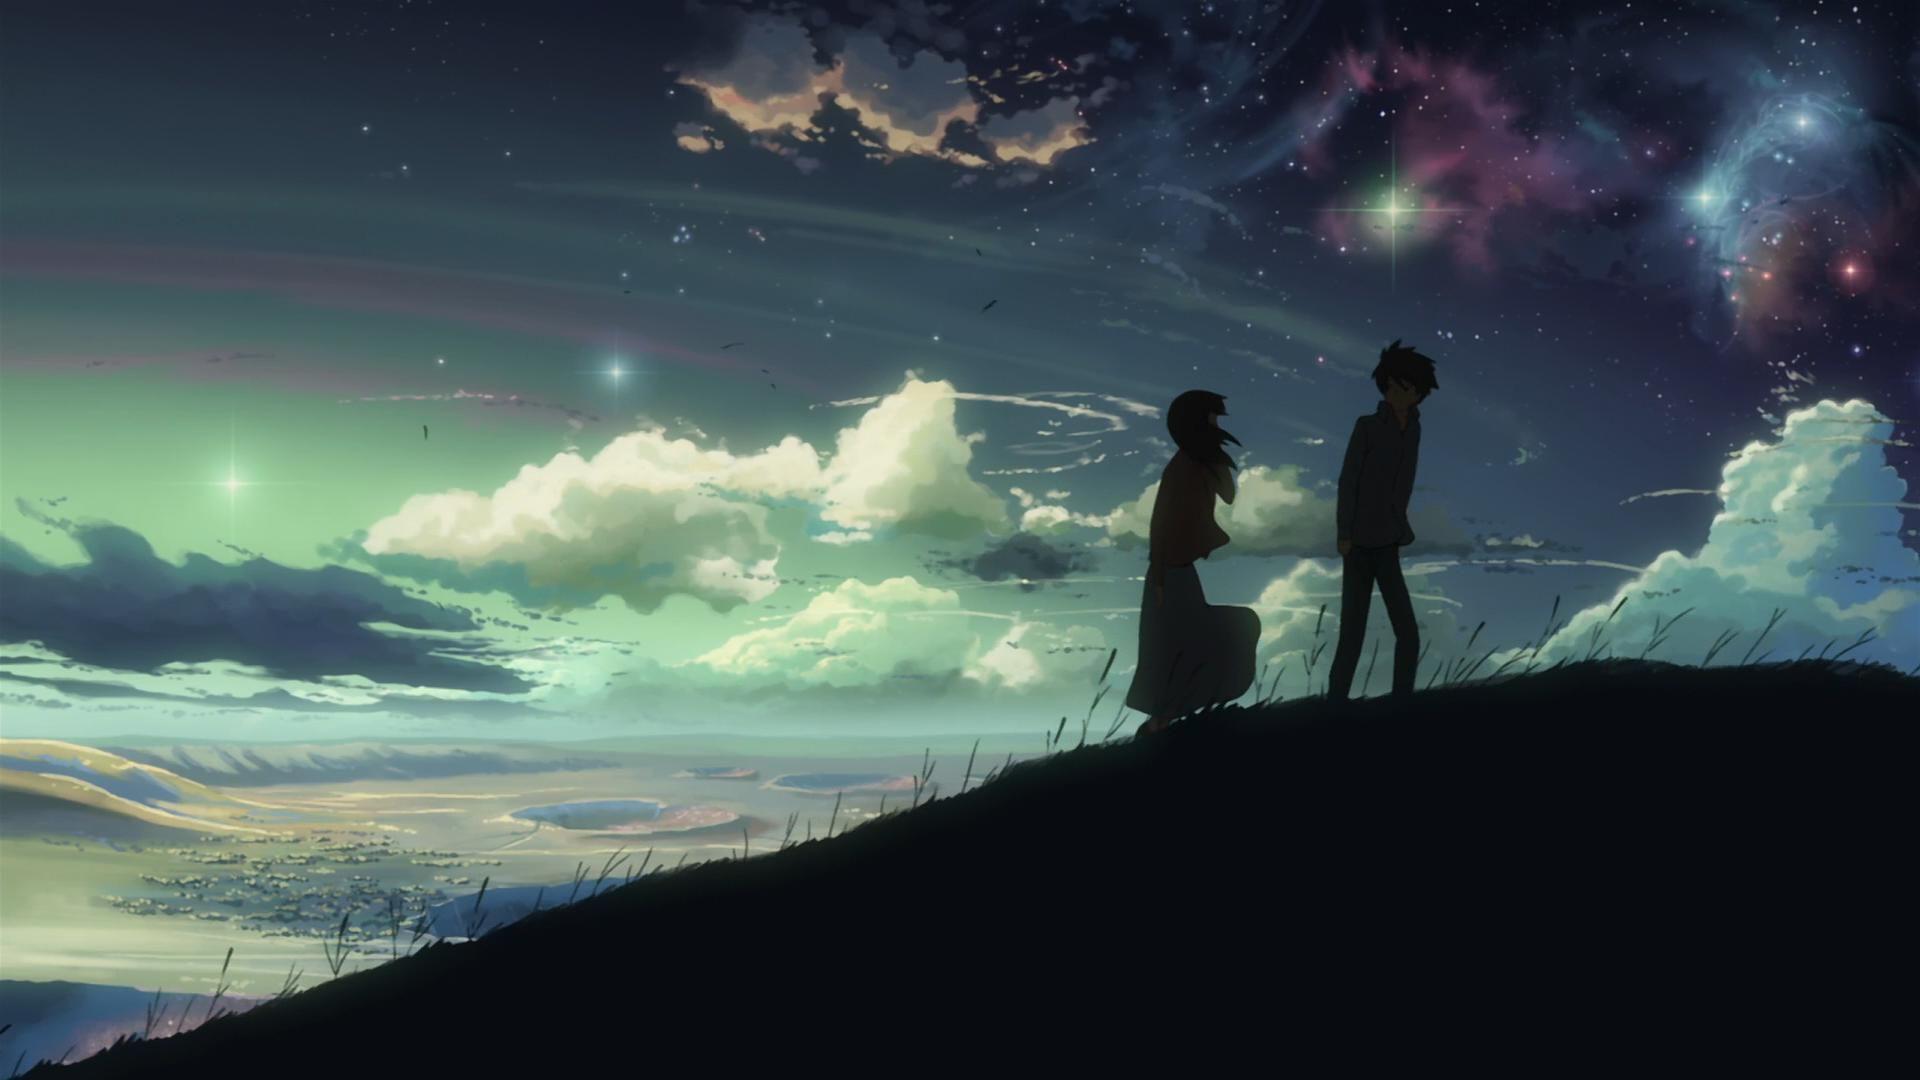 Anime Wallpaper Dark Anime Scenery Wallpaper Wide With Hd Wide